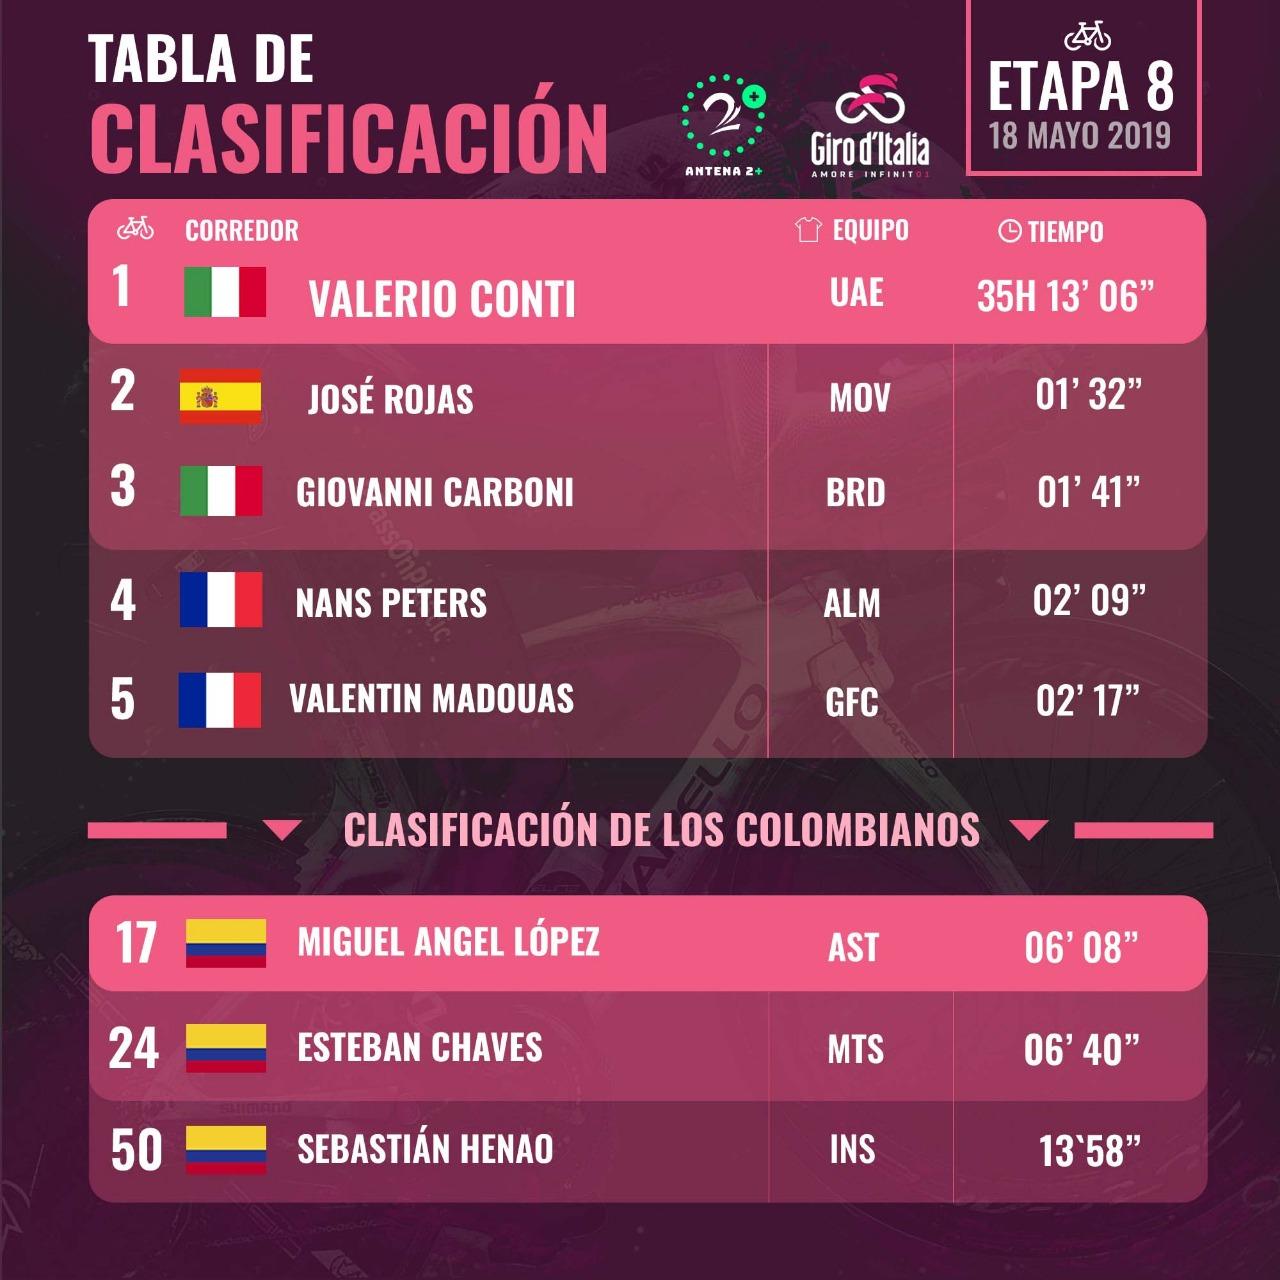 Clasificación del Giro de Italia, tras la 8 etapa